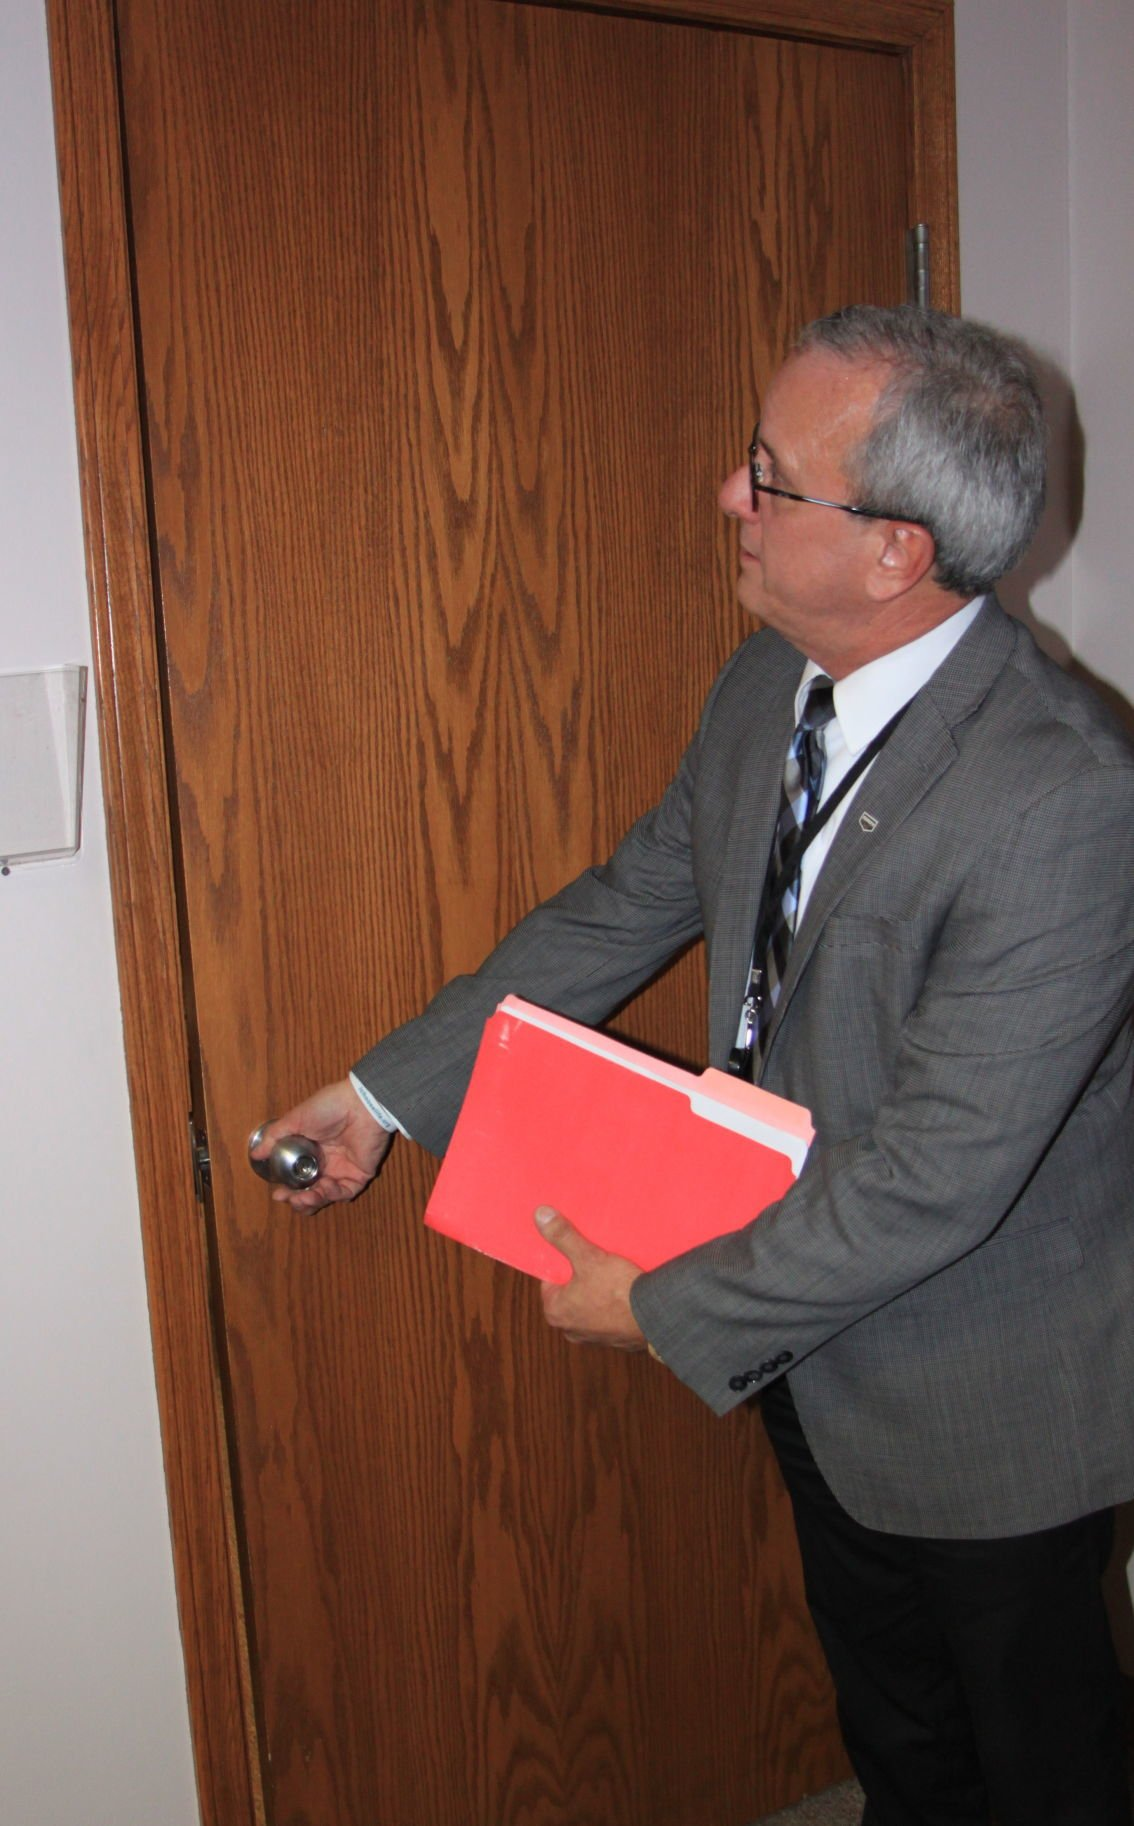 Auburn Mayor Mike Ley office door problems